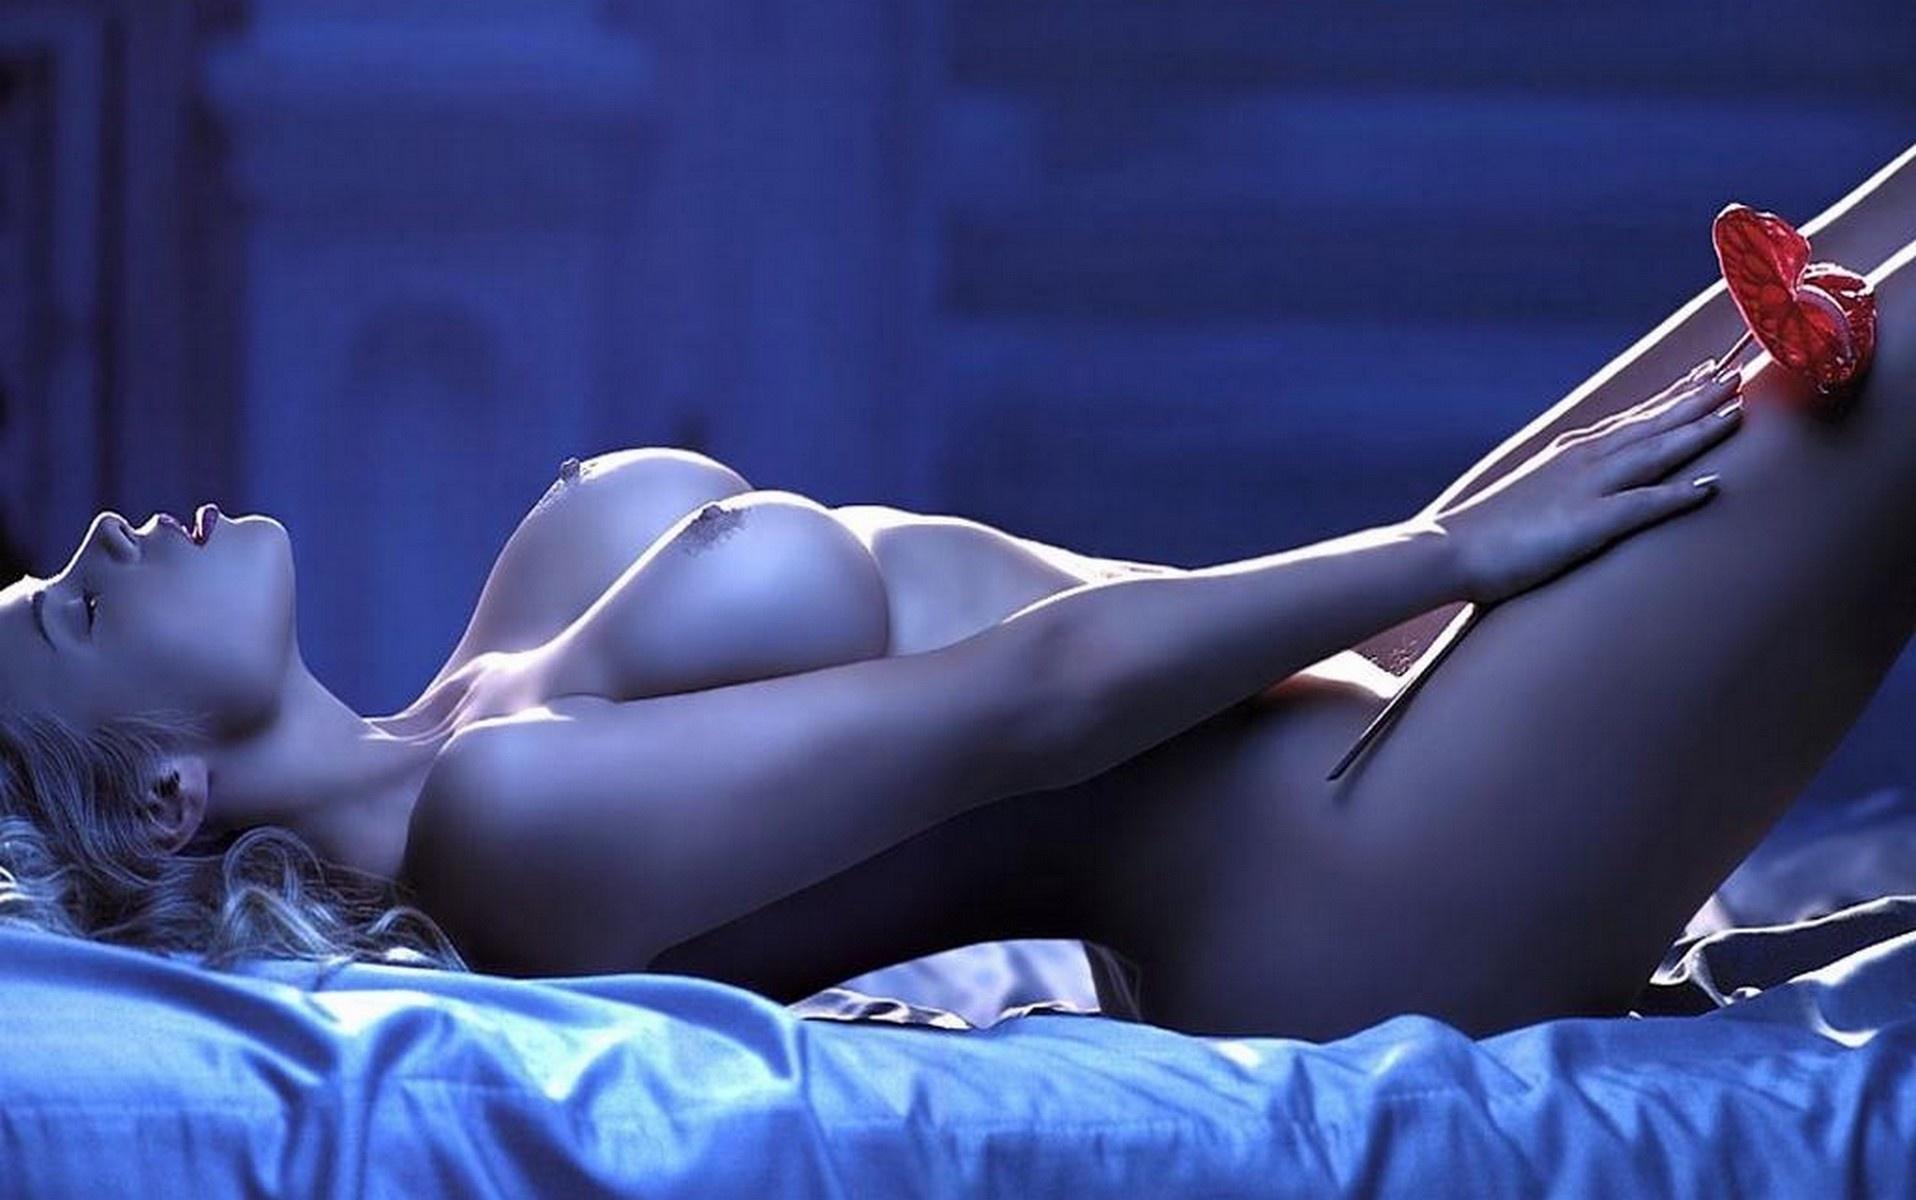 Desktop wallpapers free light erotika